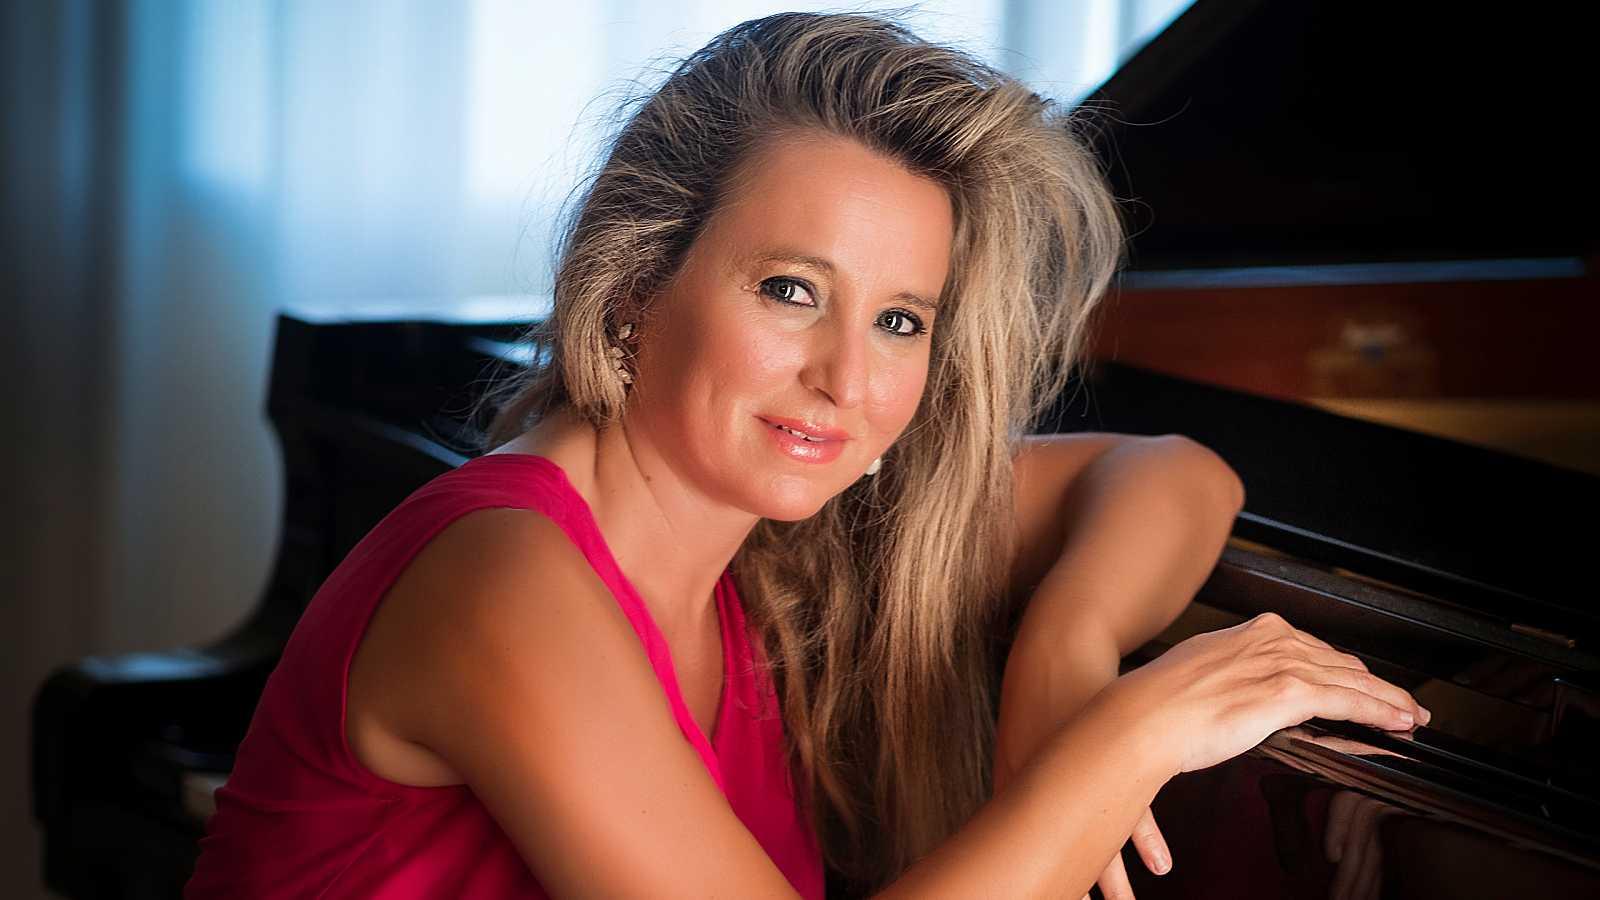 Entrevista a Paula Coronas 'Femmes d'Espagne' - escuchar ahora